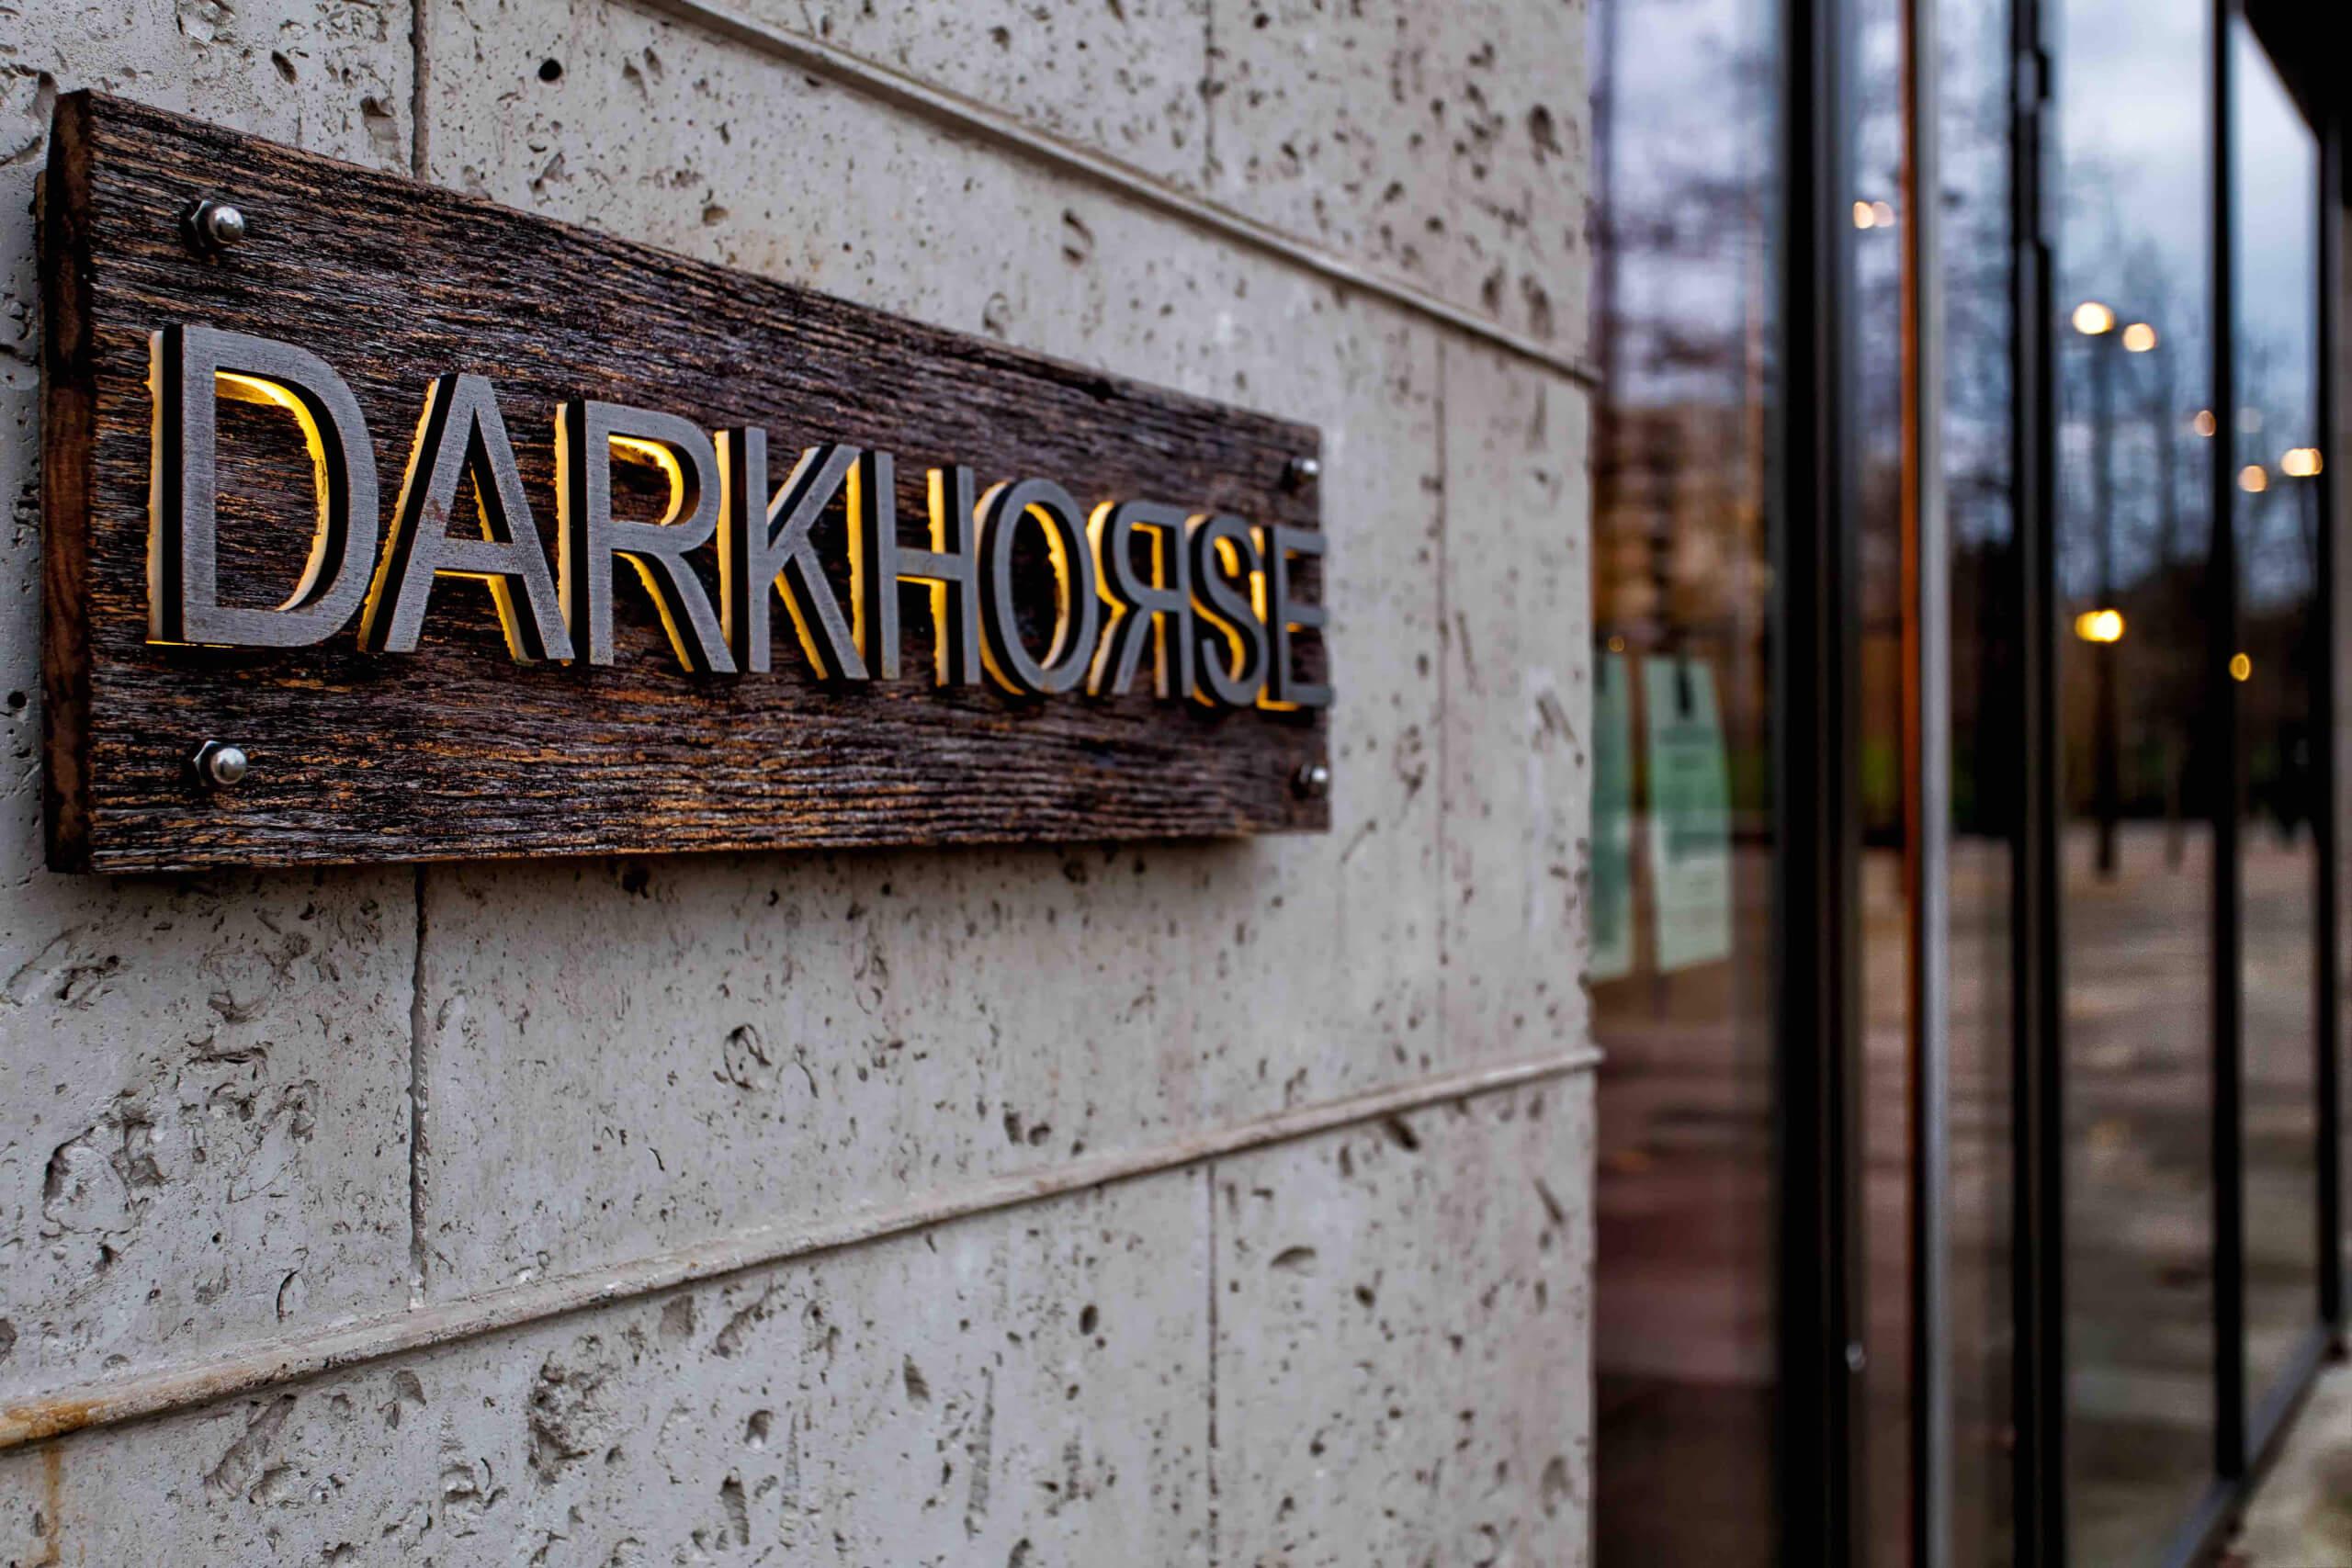 darkhorse-restaurant_mg_3654_hdr